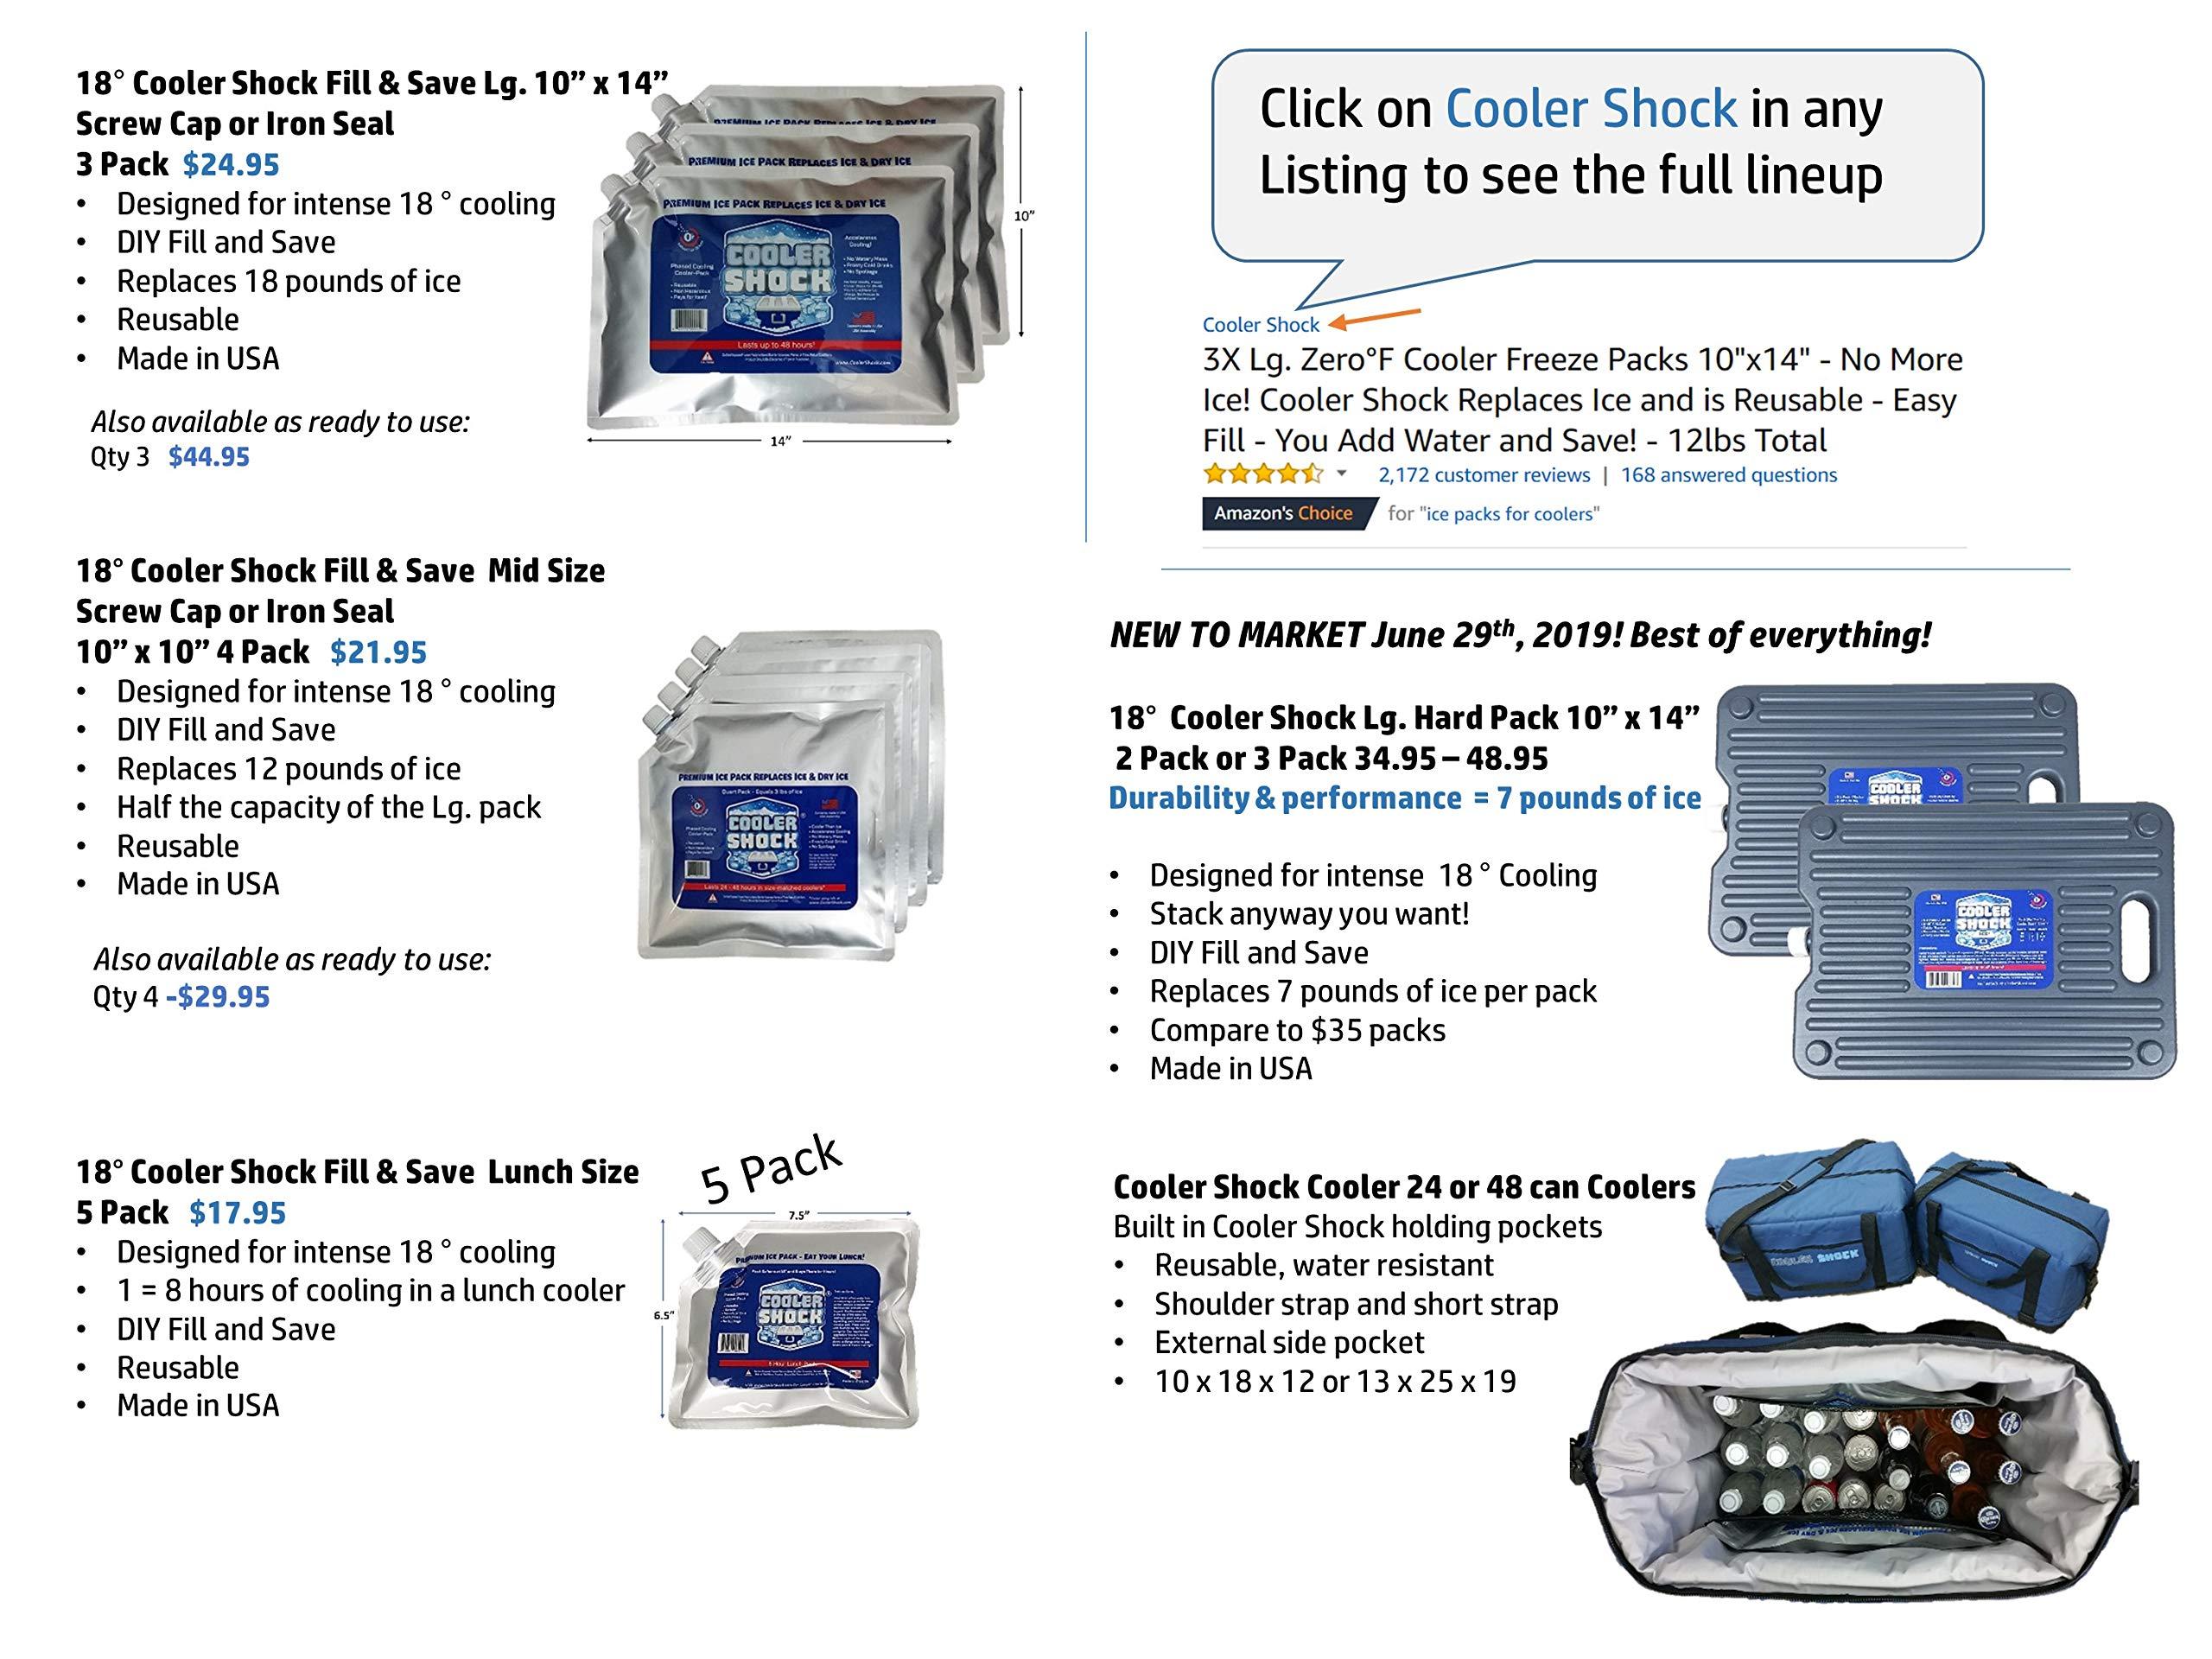 "Cooler Shock LG Zipper Reusable Cooler Ice Packs Replace Ice 10/"" x 14/"""